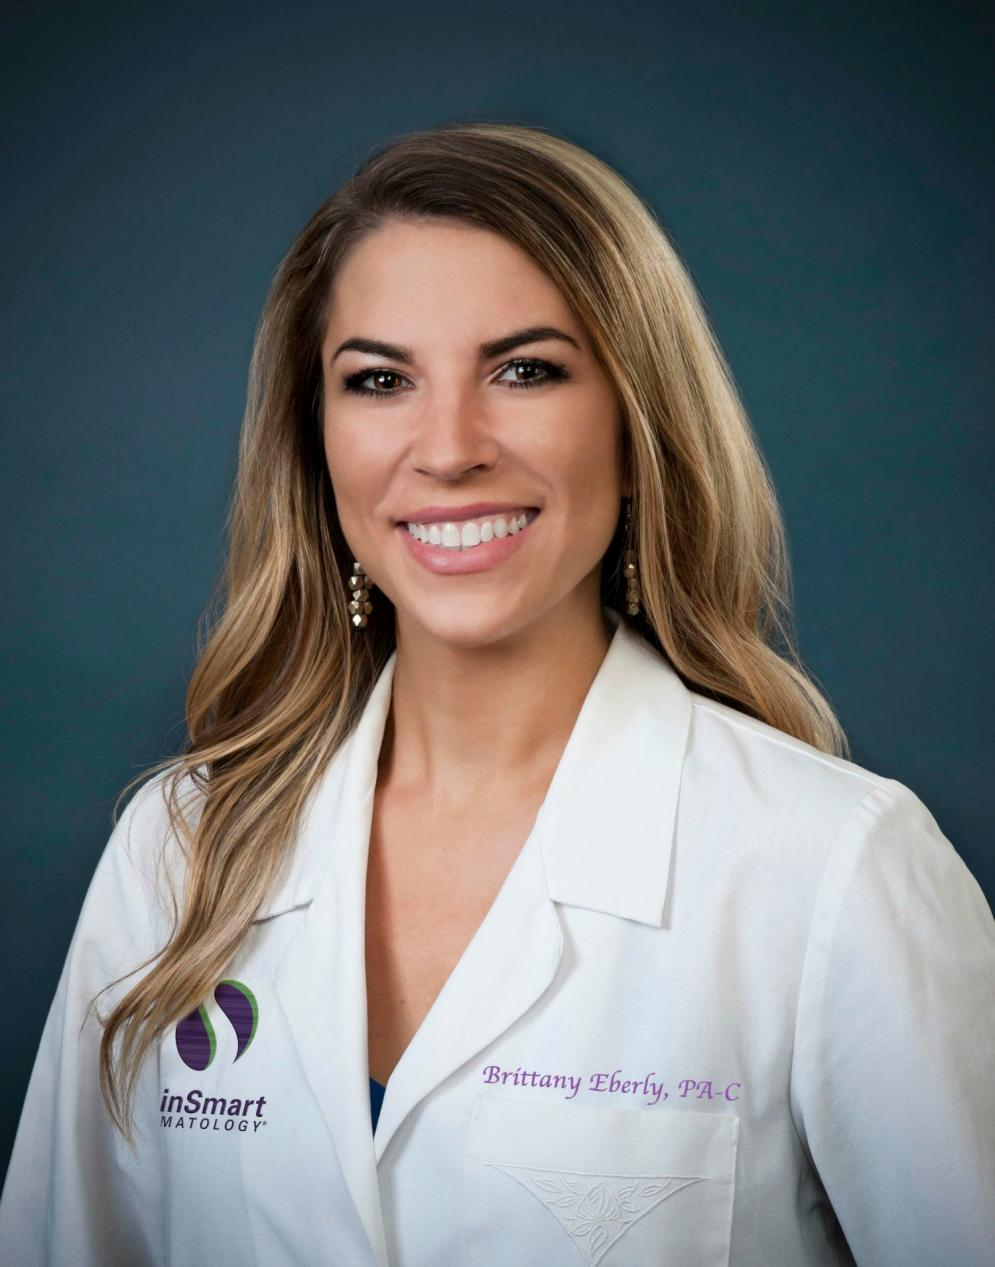 Brittany Eberly, PA-C